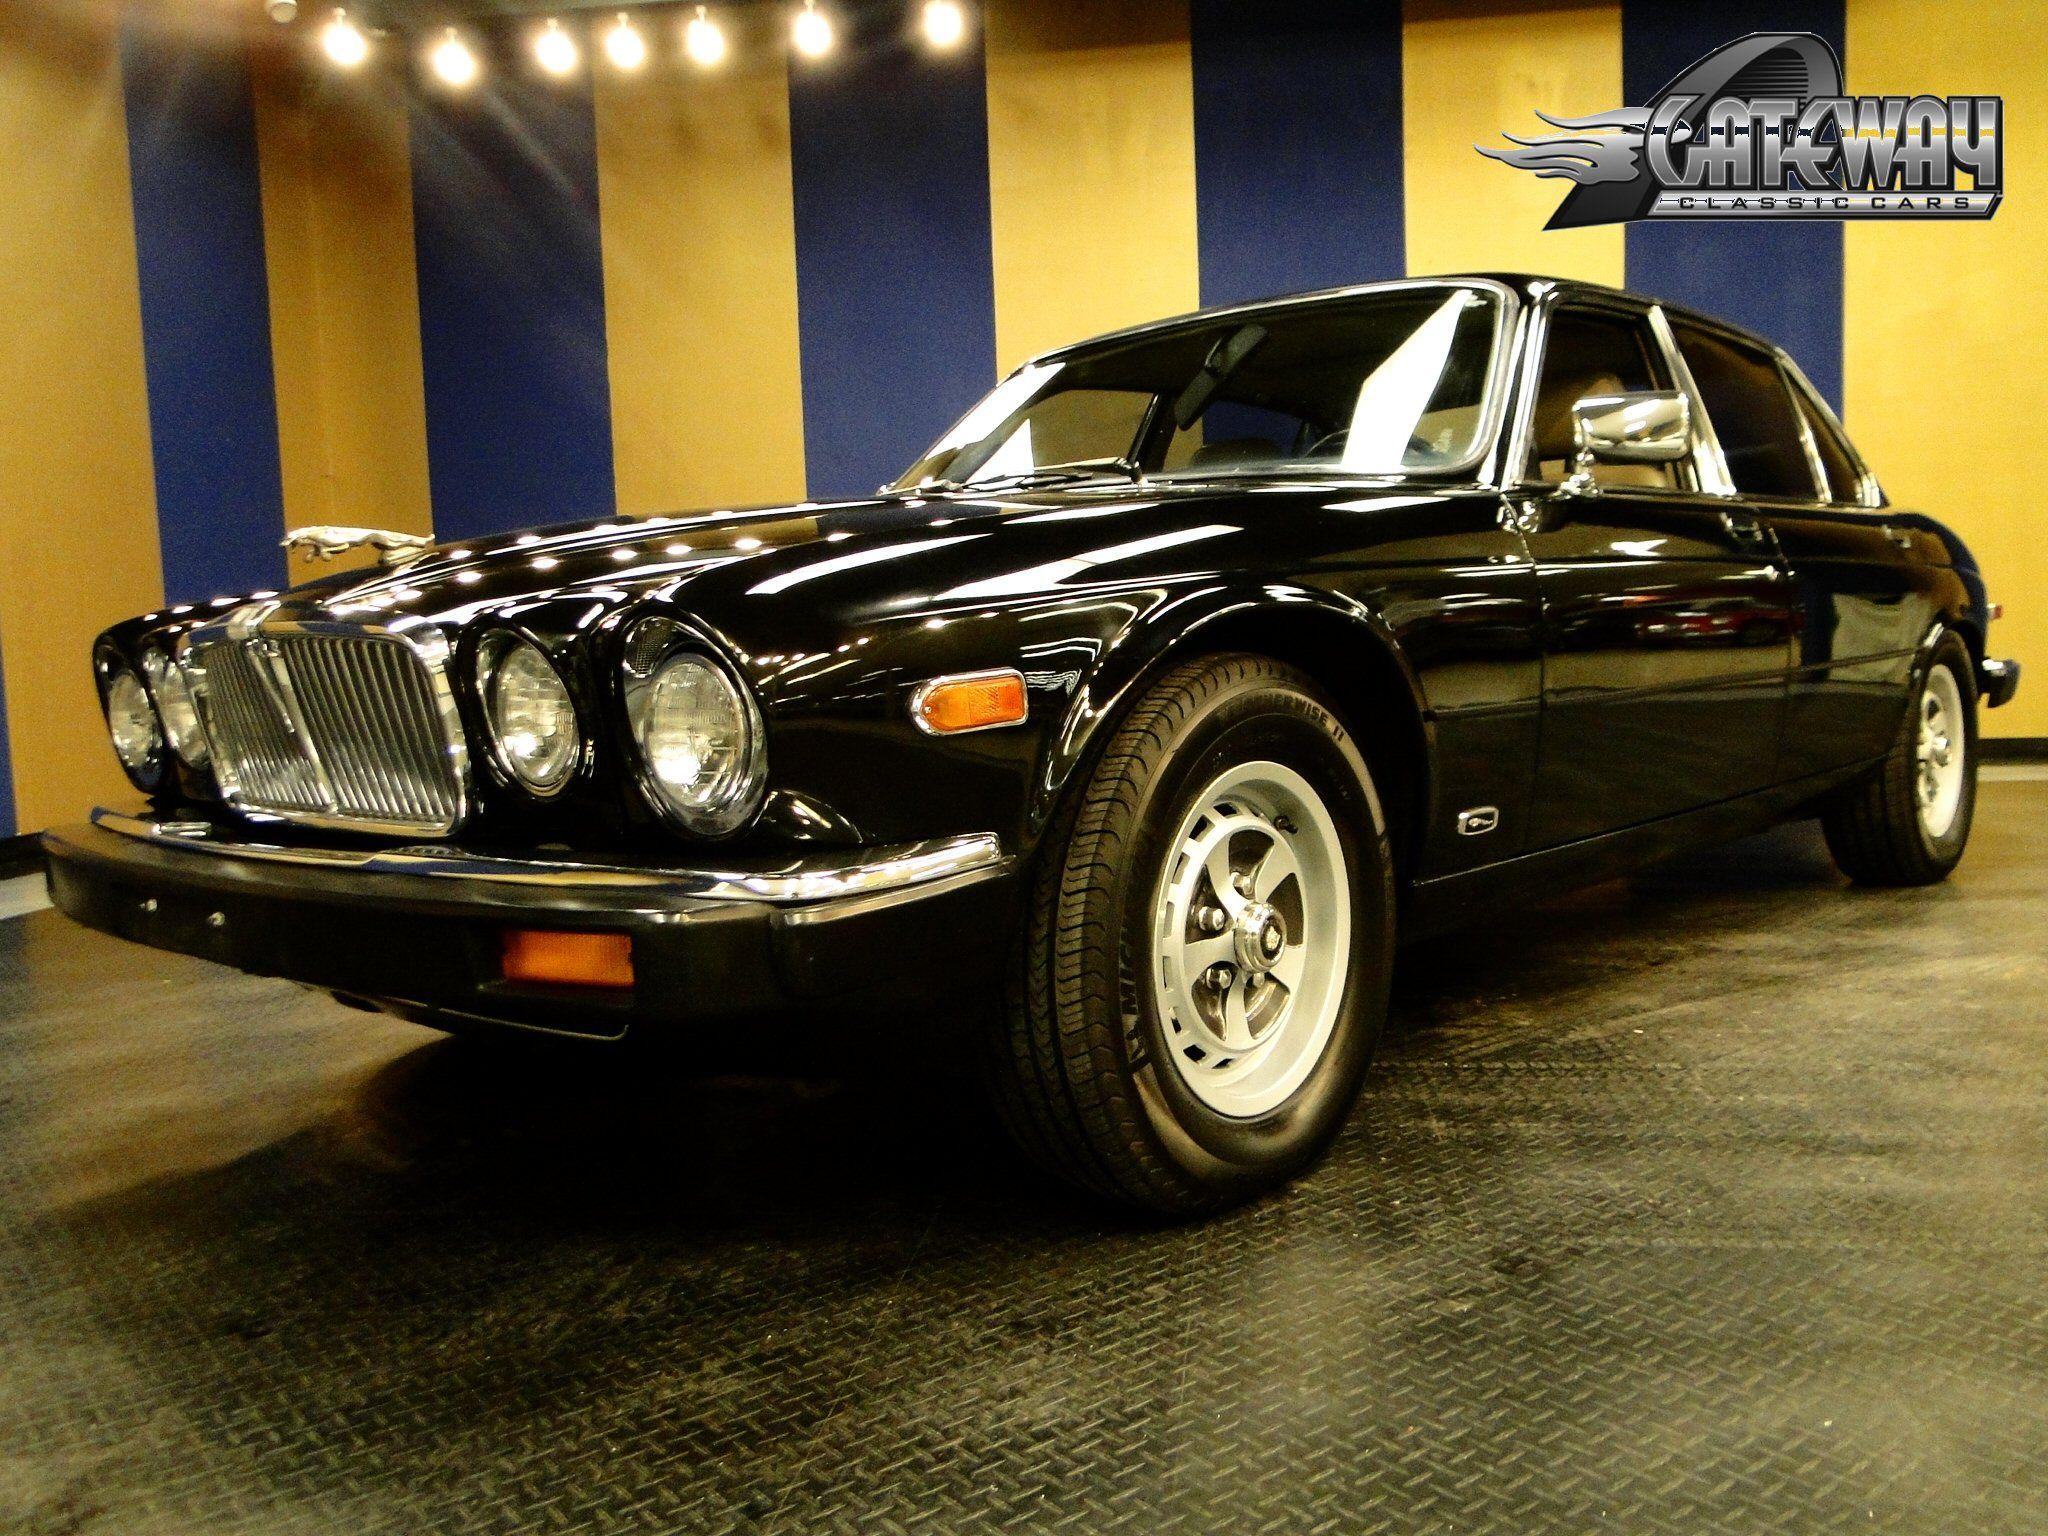 27448d4f8bbba0dd743759f2f54753d5?resize=665%2C499&ssl=1 1989 jaguar xj6 vanden plas review best jaguar in the word 2017 1988 XJ6 Vanden Plas at aneh.co